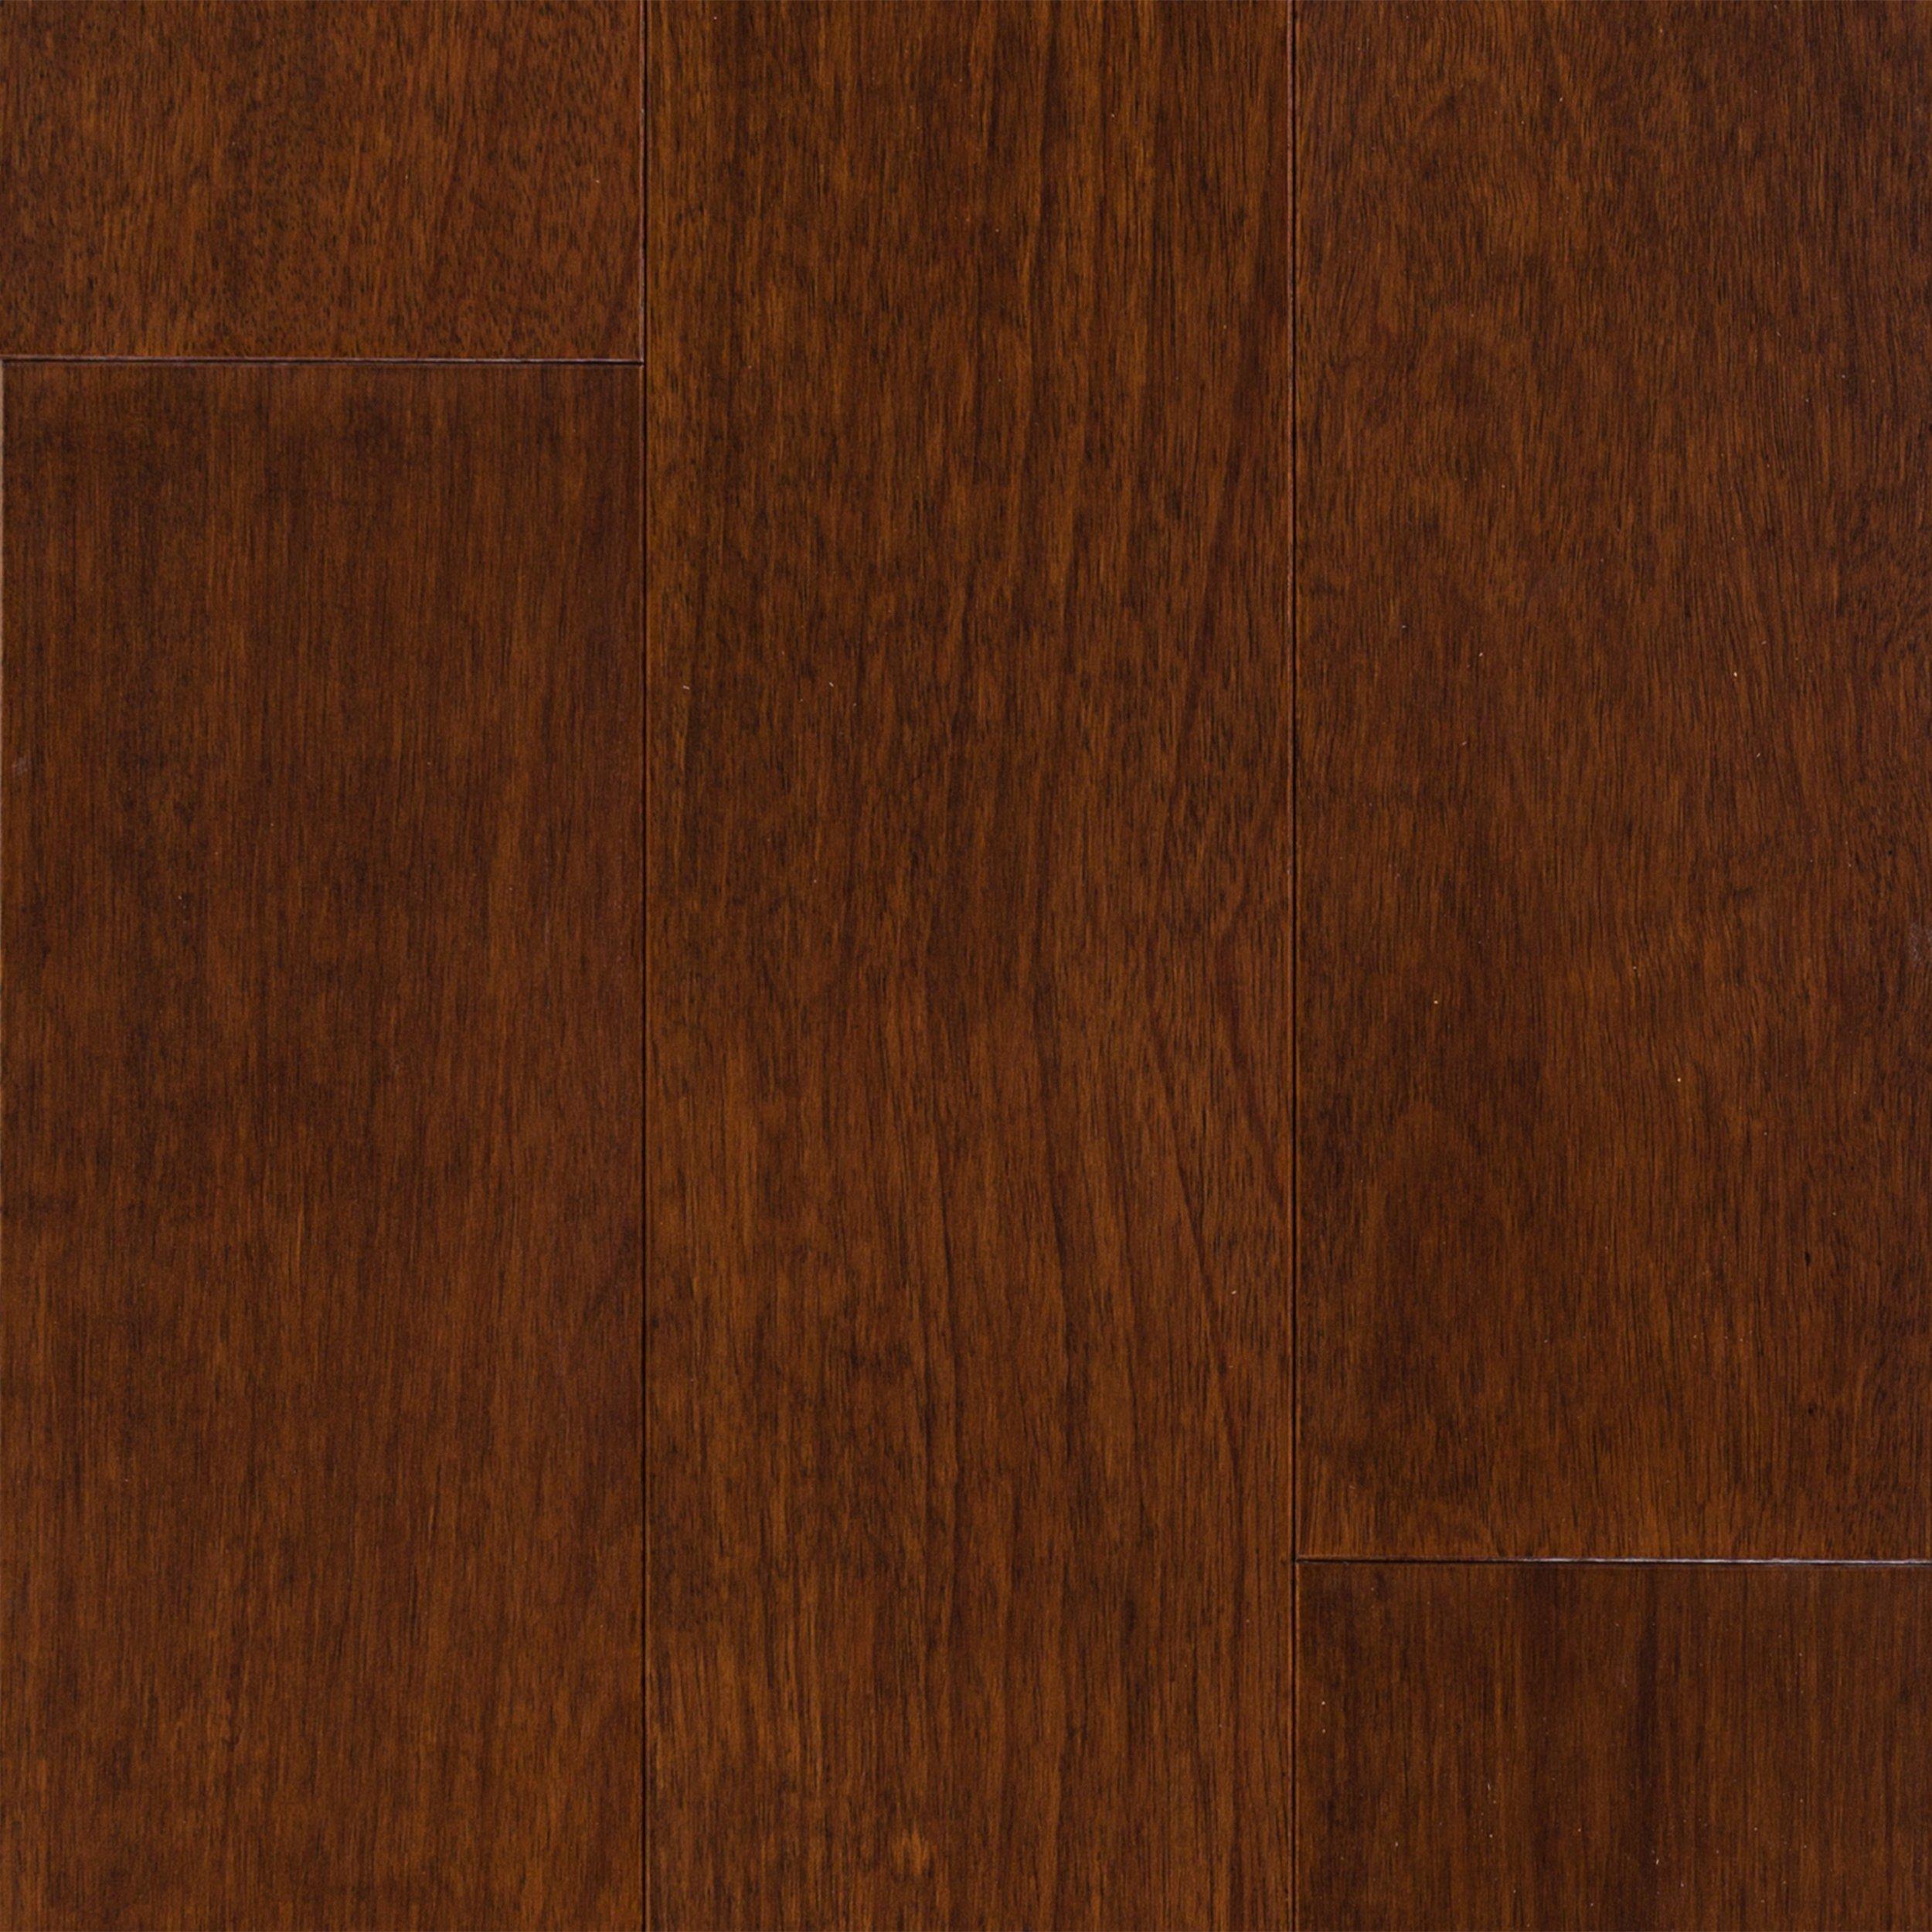 Solid Brazilian Walnut Hardwood Flooring: Natural Brazilian Chestnut Smooth Solid Hardwood